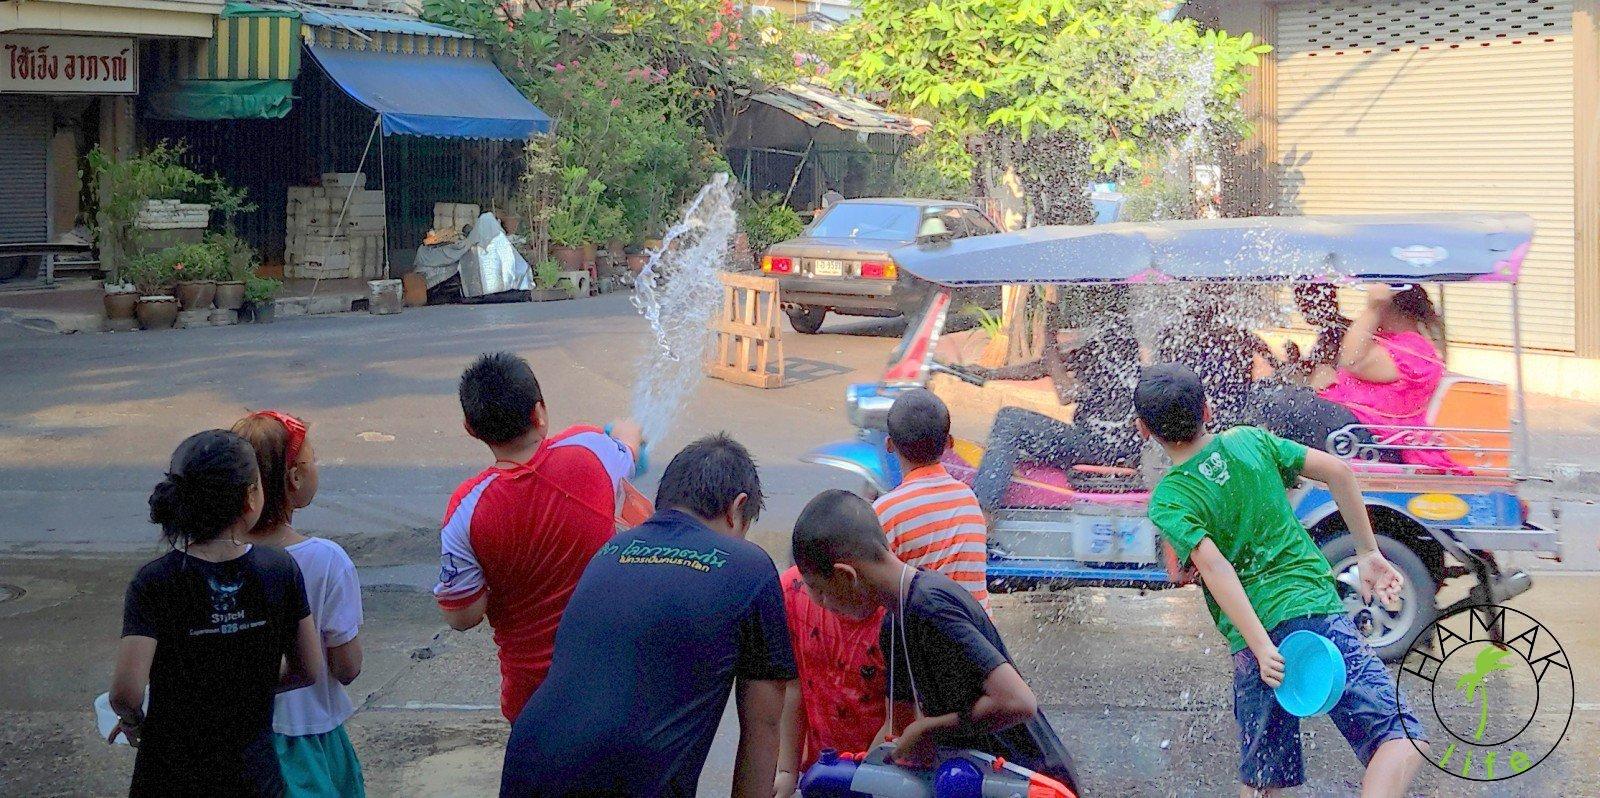 Songkran Festival, czyli Nowy Rok w Bangkoku